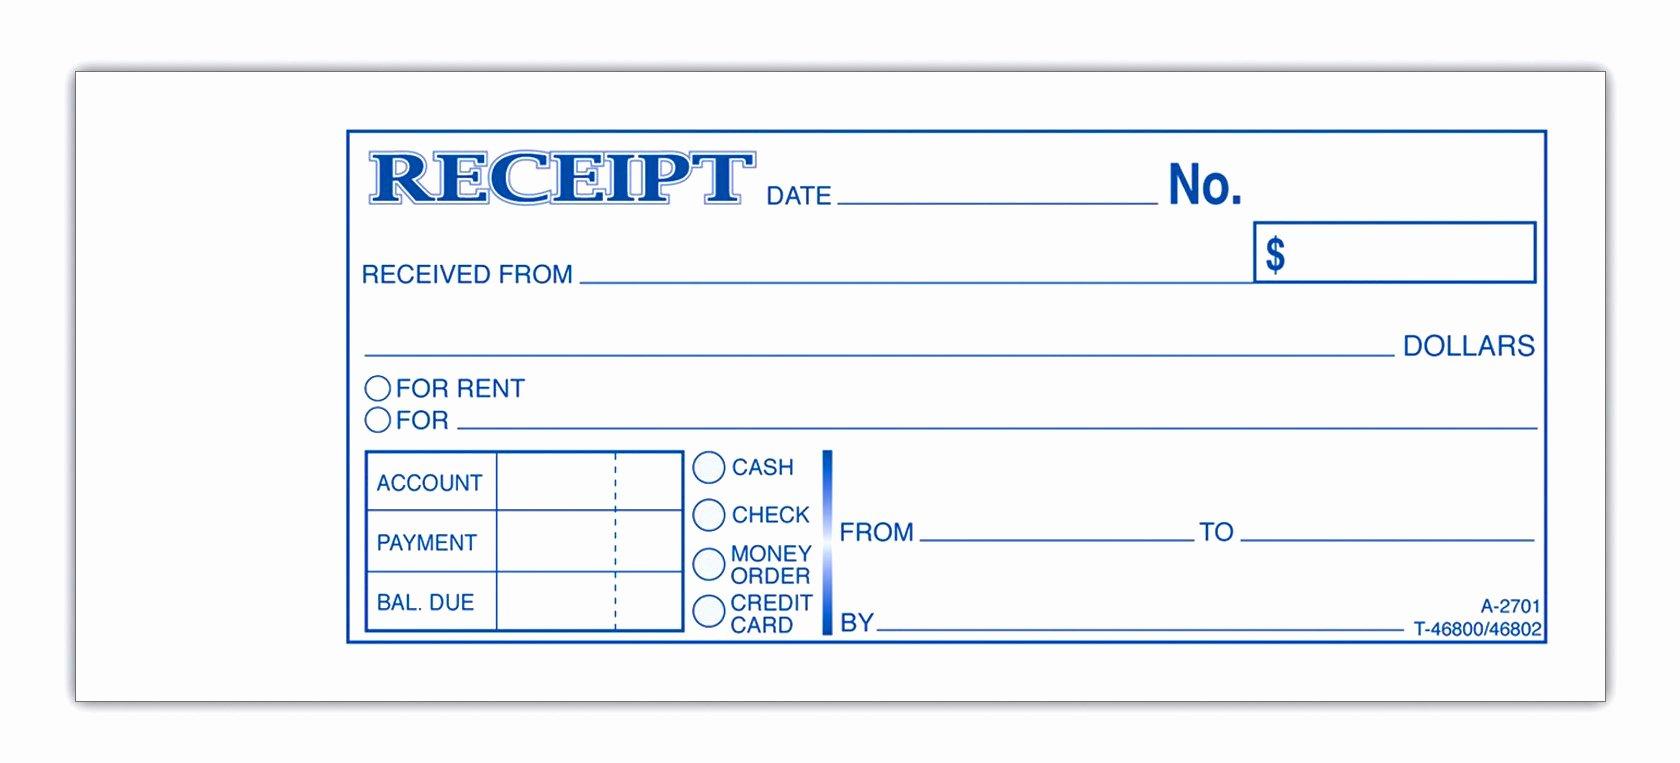 Receipt Template Free Printable New Blank Receipt Template Example Mughals Zasvobodu